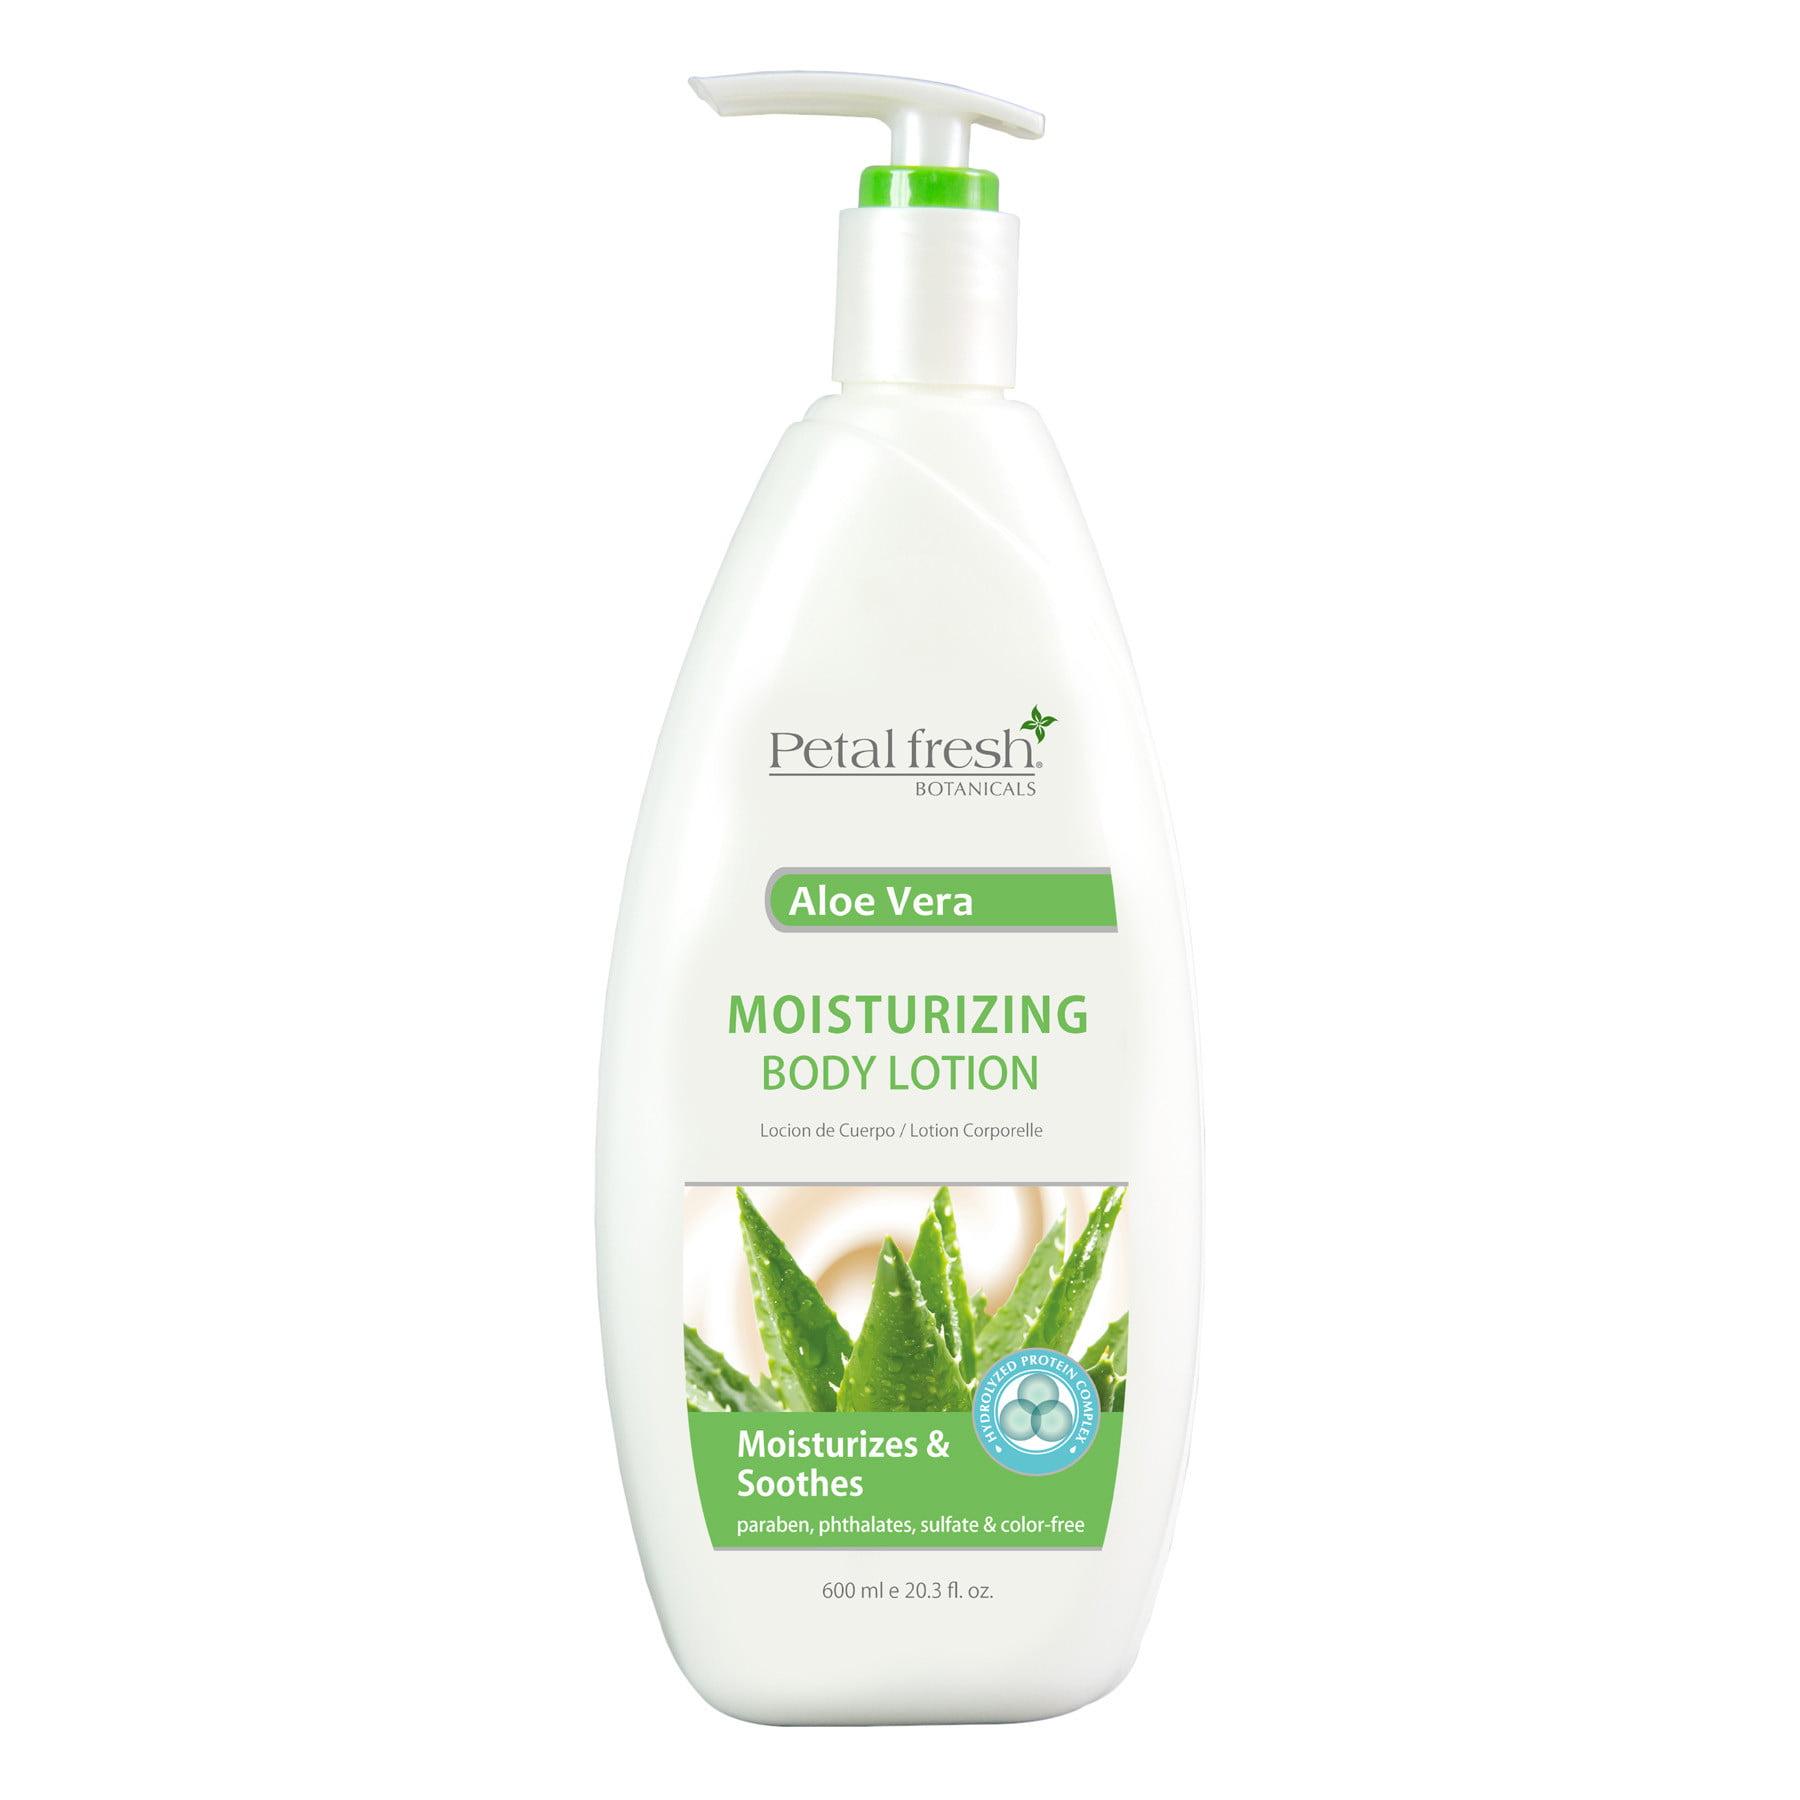 BCL Petal Fresh Aloe Vera Body Lotion 20.3 oz